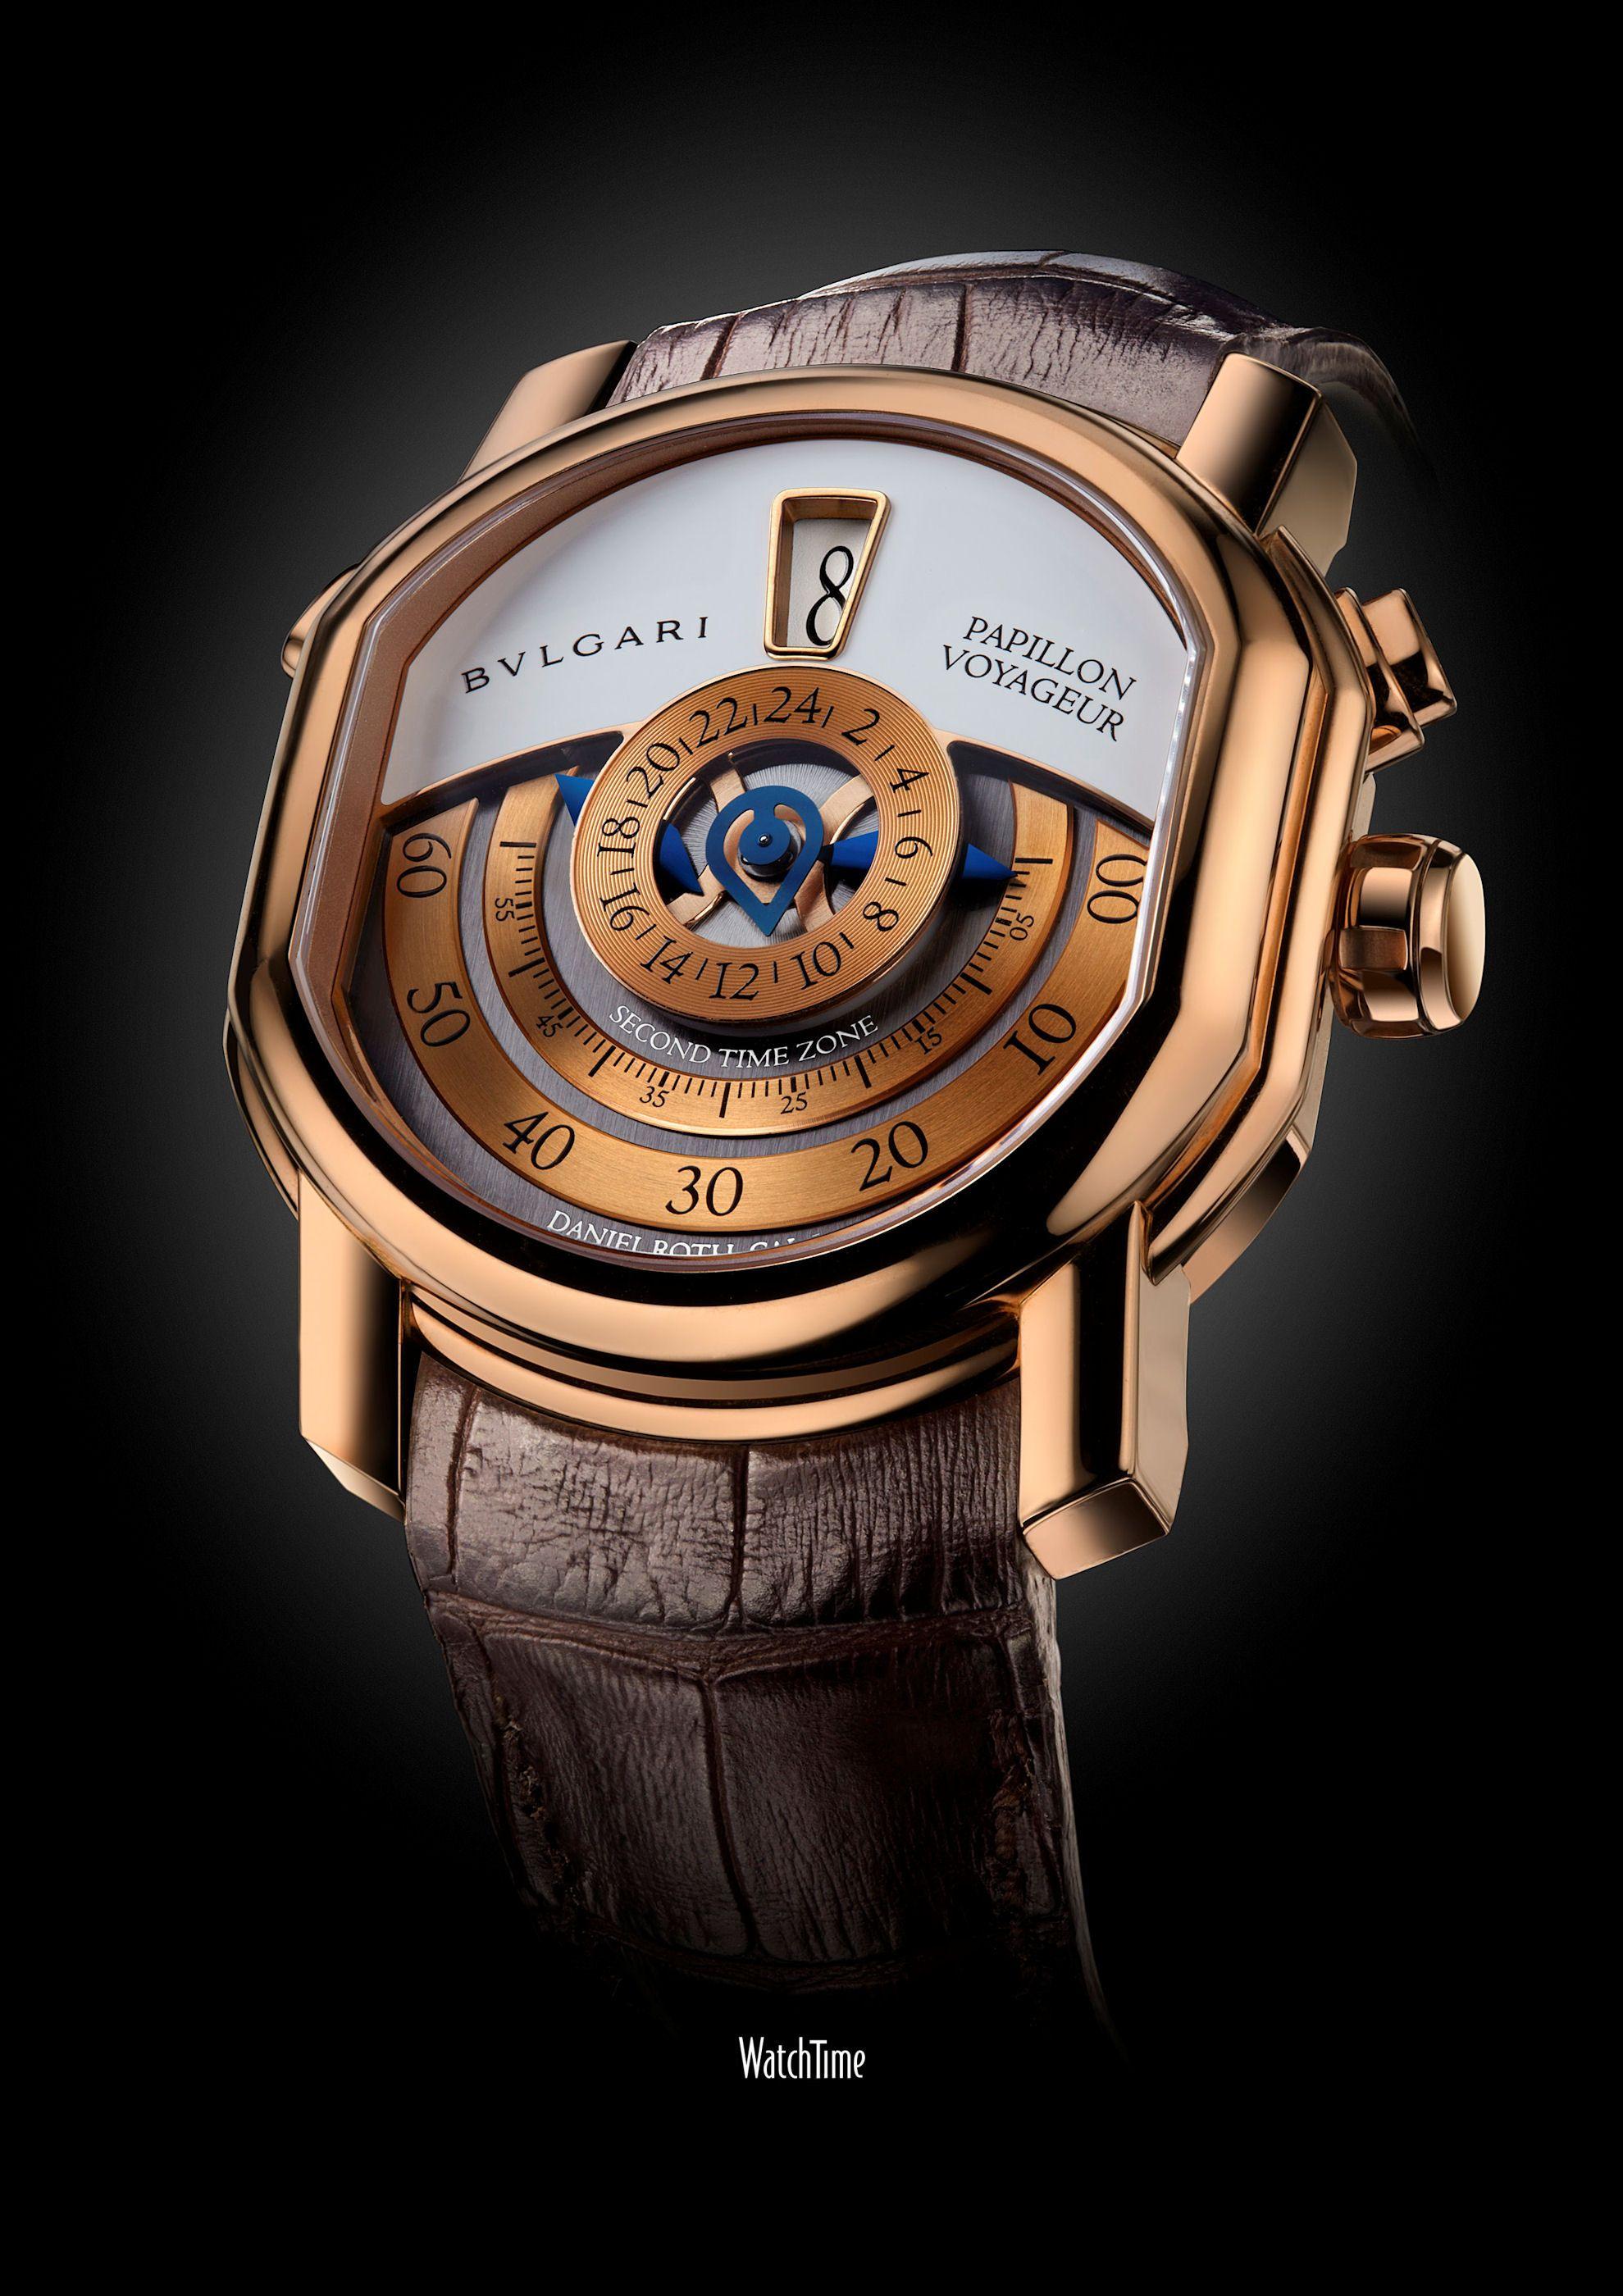 mejor servicio 399eb 0e892 Bulgari Papillon Voyageur   relojes   Relojes de lujo para ...